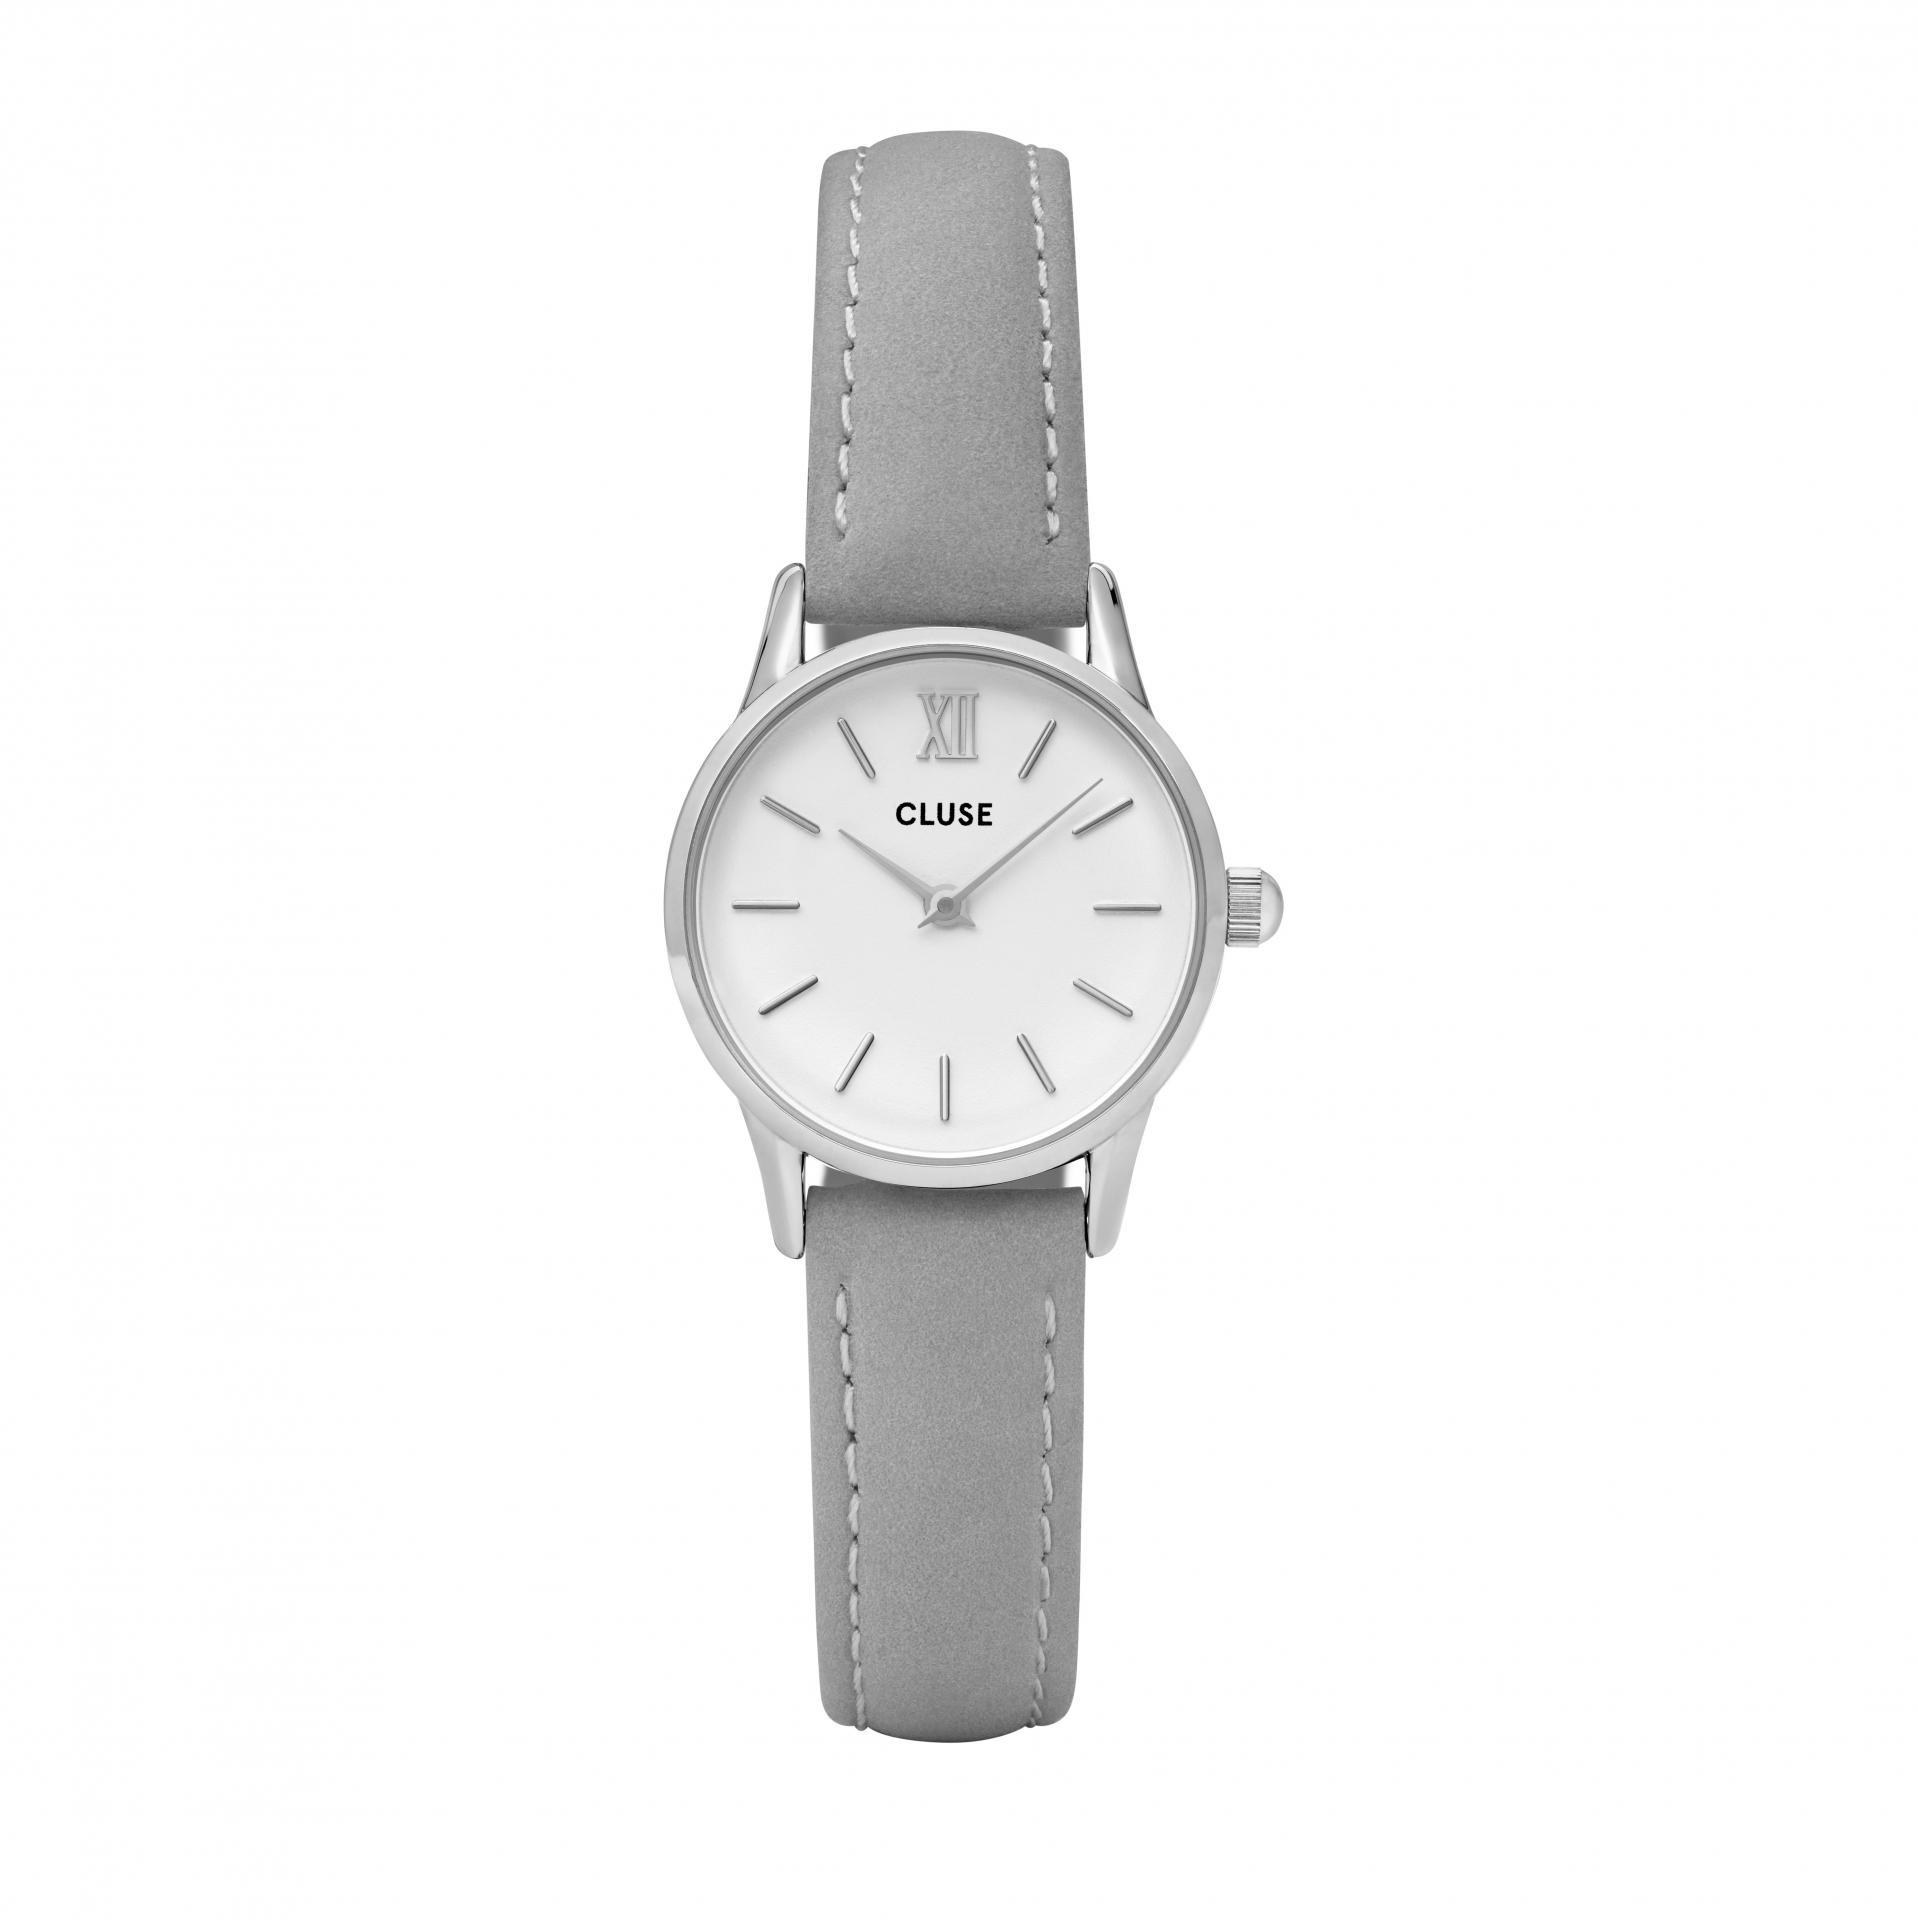 CLUSE Hodinky Cluse La Vedette Silver White/Grey, šedá barva, stříbrná barva, kov, kůže